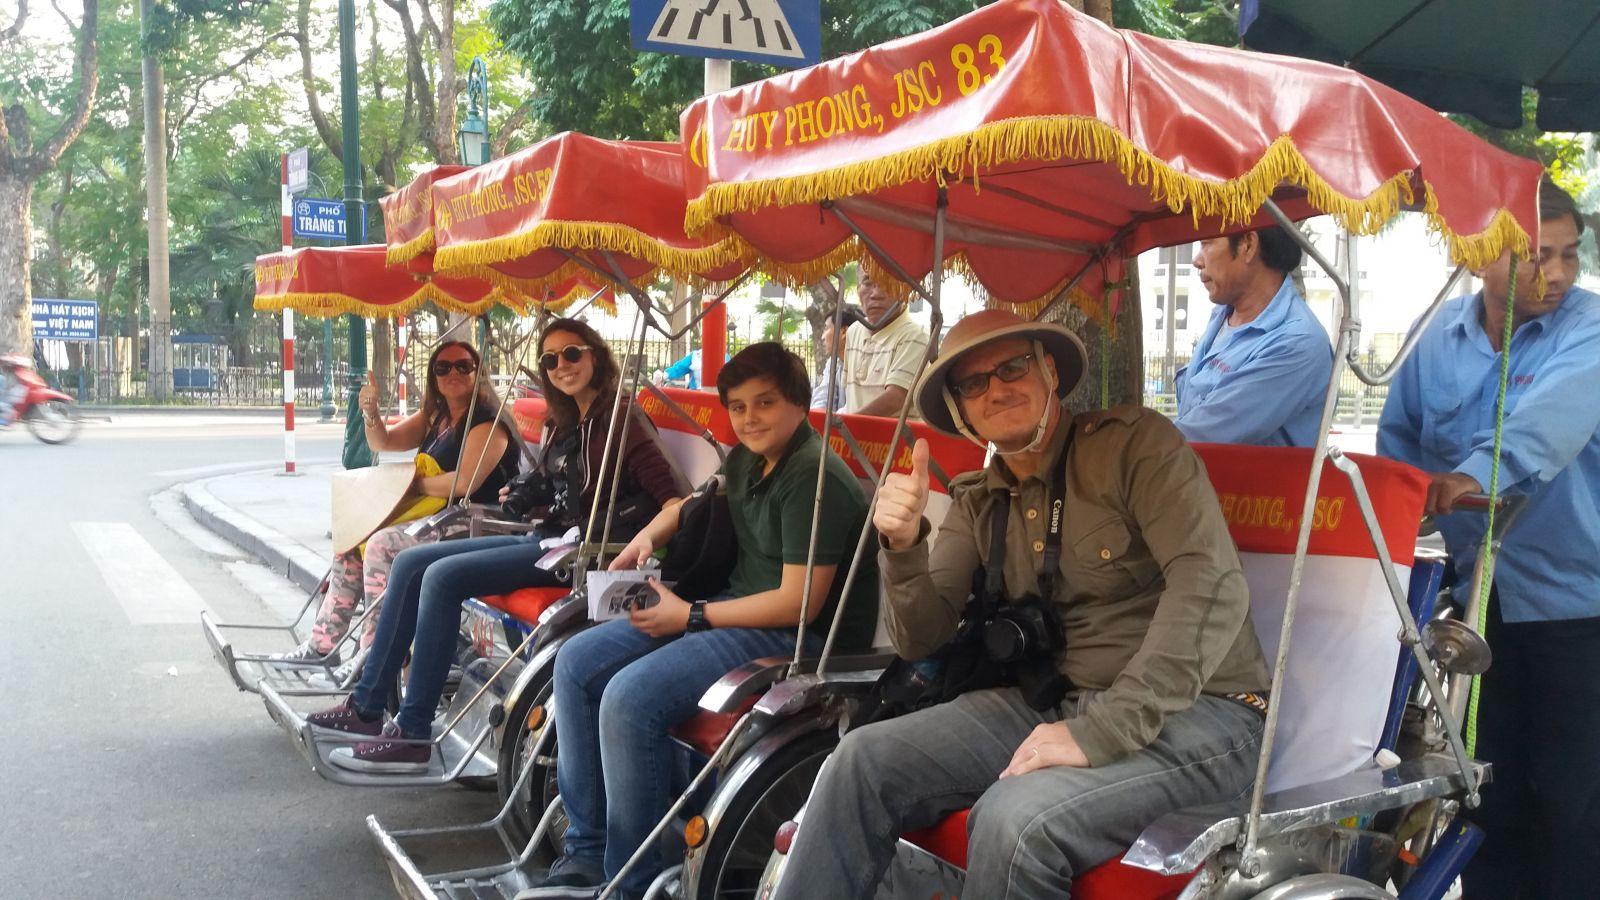 Vietnam Family Holiday Cyclo tour